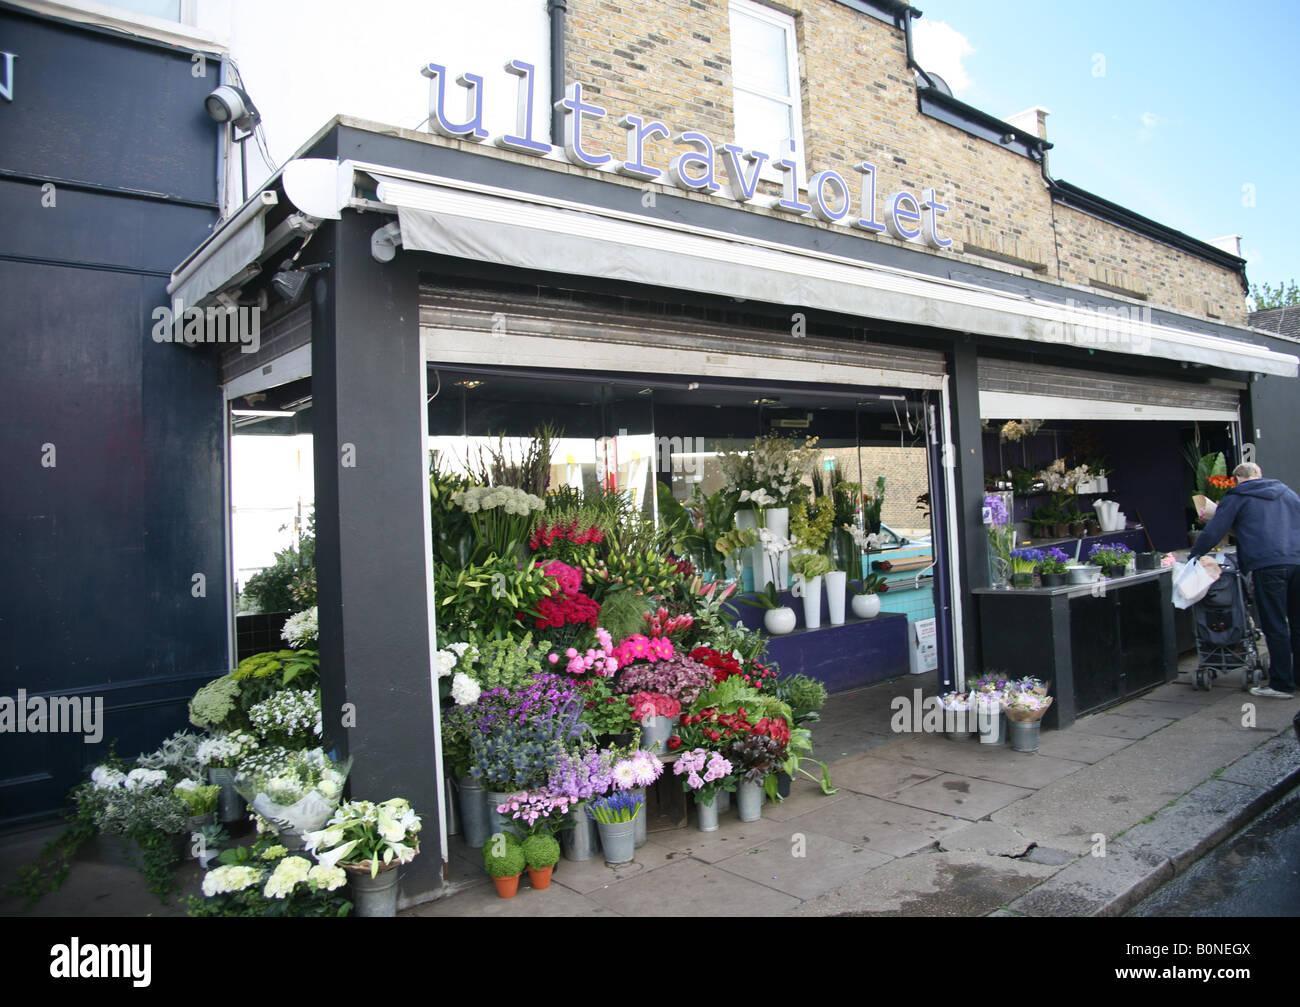 Ultraviolet Florists Northcote Road London - Stock Image